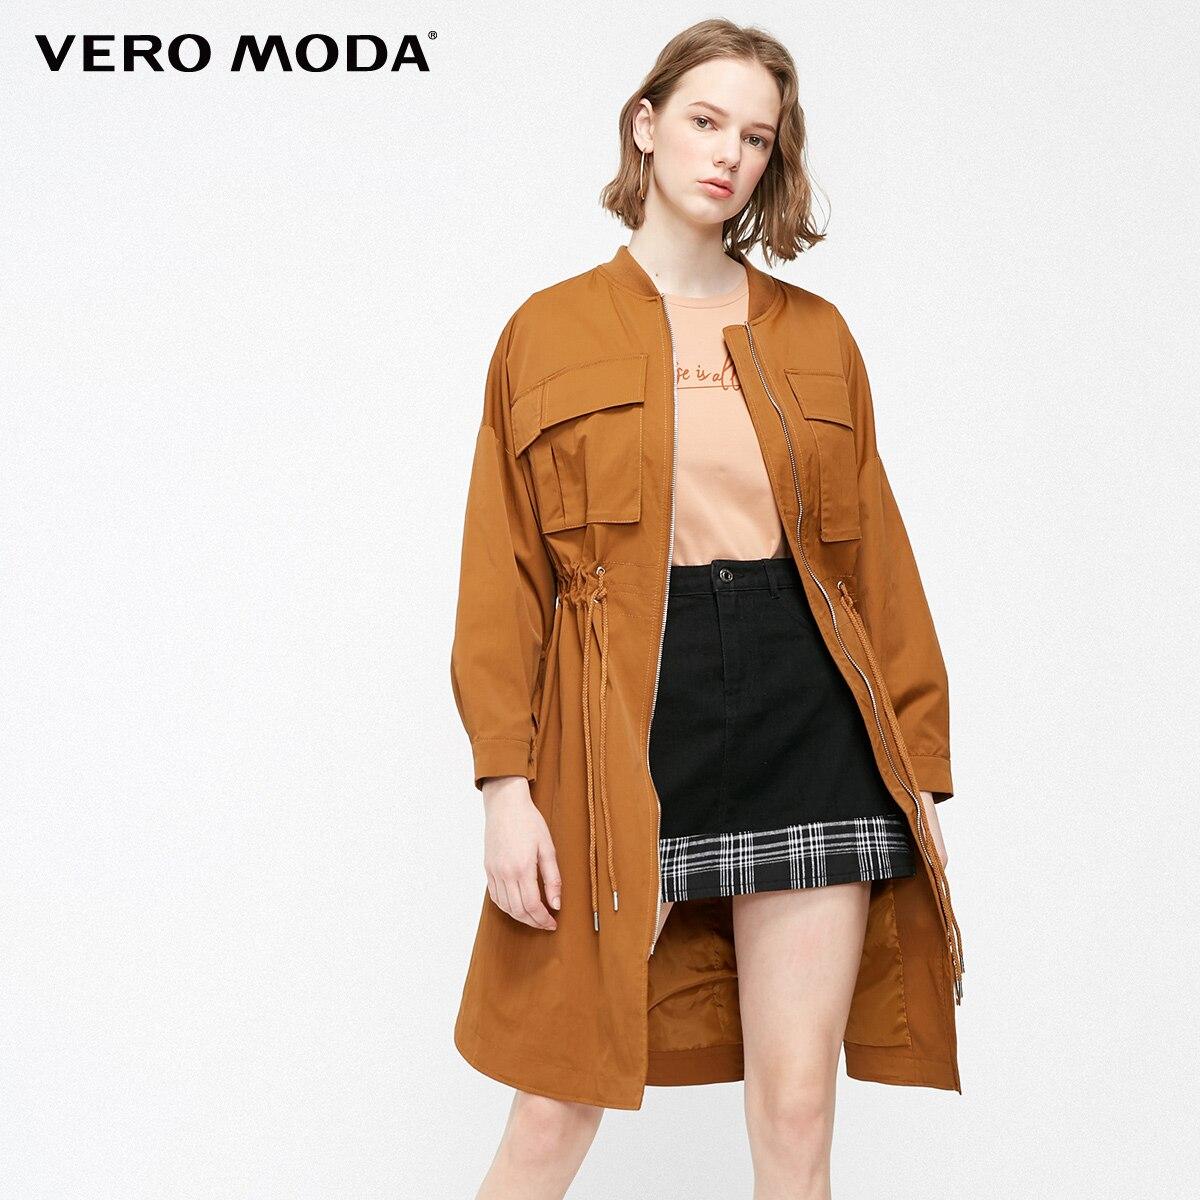 Vero Moda Women's Streetwear Waist Drawstring Casual Long Trench Coat   319121542